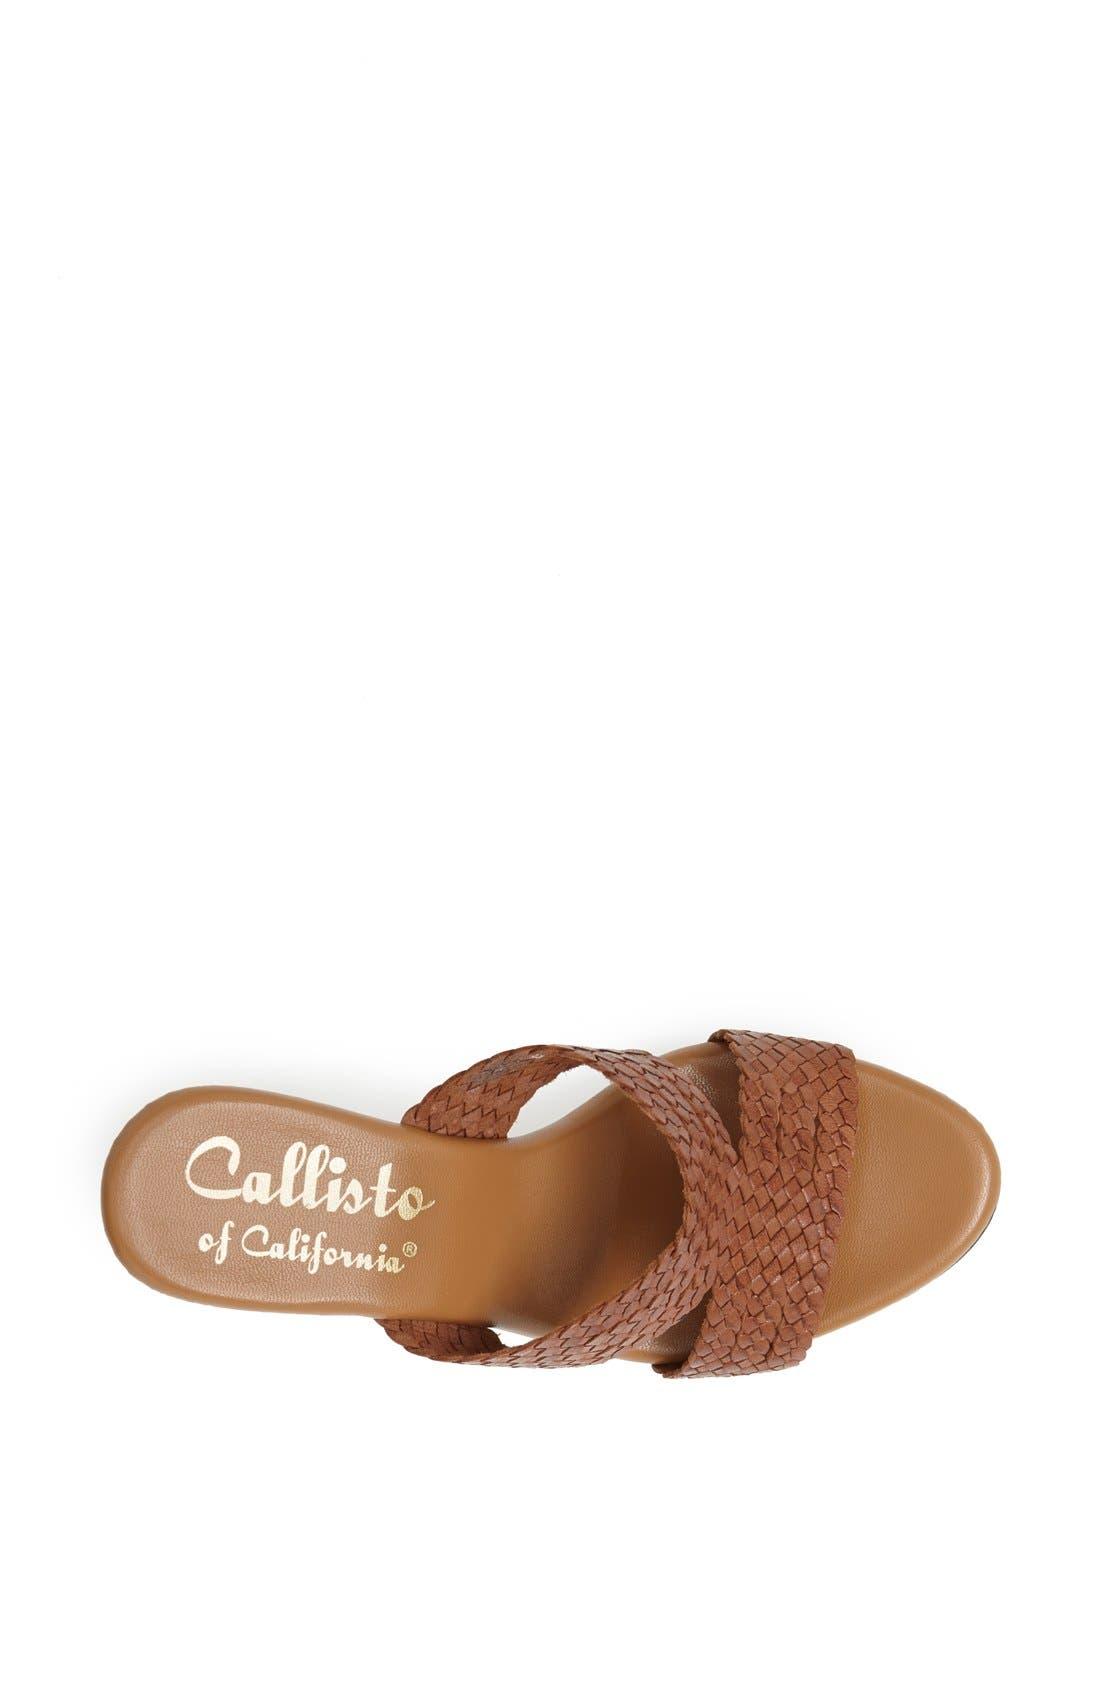 Alternate Image 3  - Callisto 'Order' Platform Sandal